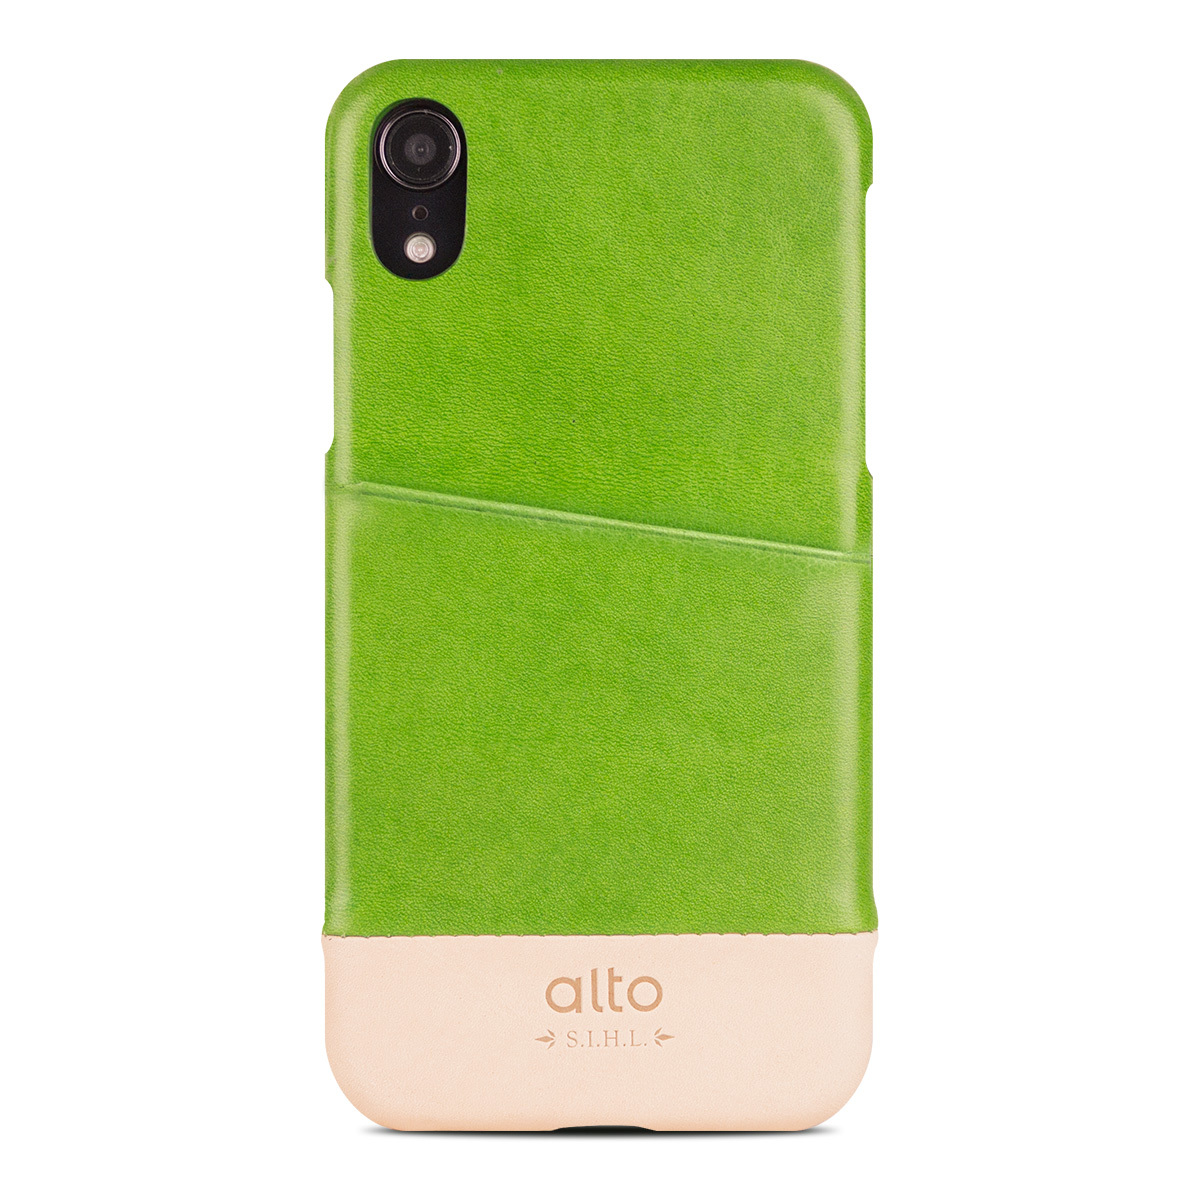 iPhone XR 皮革保護殼 Metro Leather Case 萊姆綠/本色